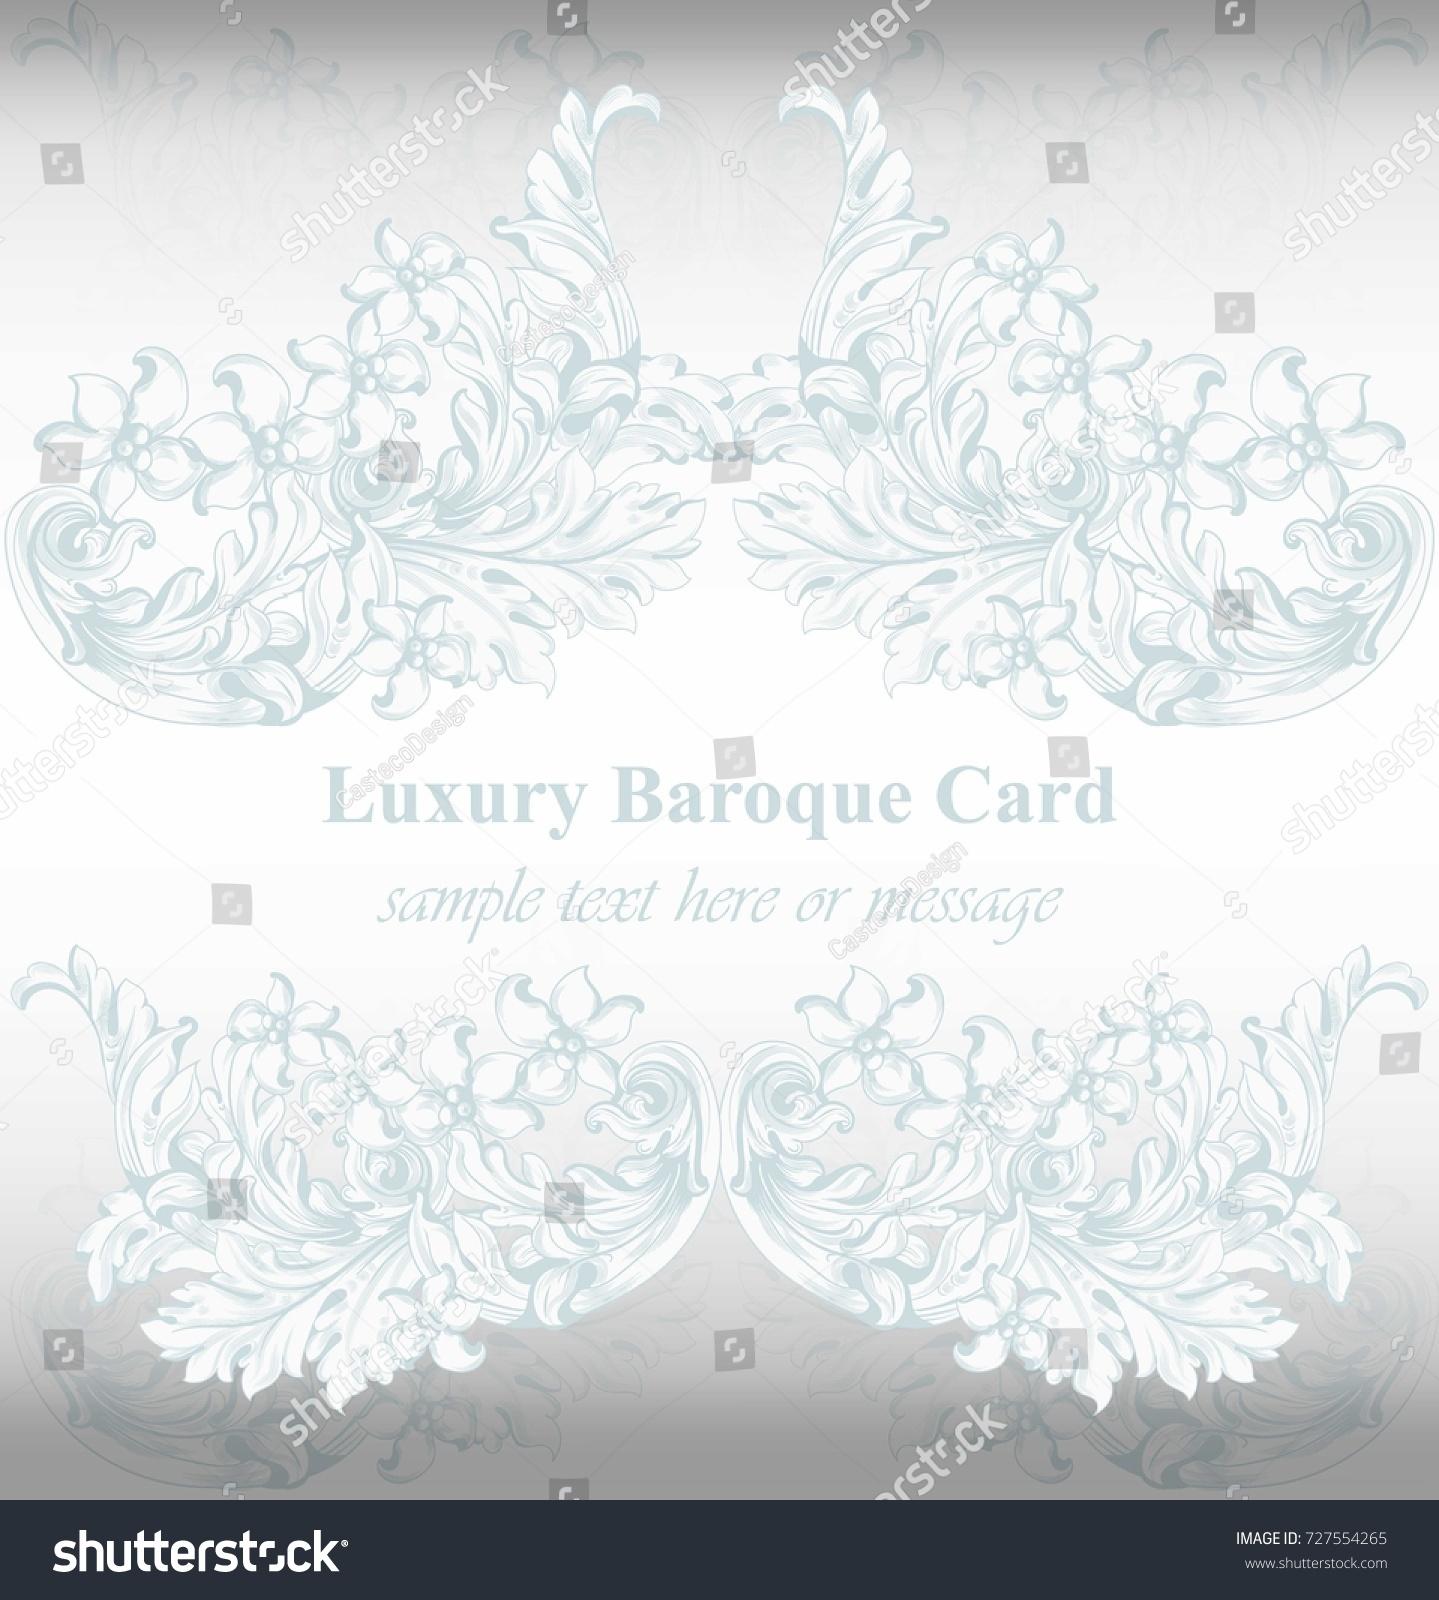 Luxury invitation card vector royal victorian stock vector 727554265 luxury invitation card vector royal victorian stock vector 727554265 shutterstock stopboris Images